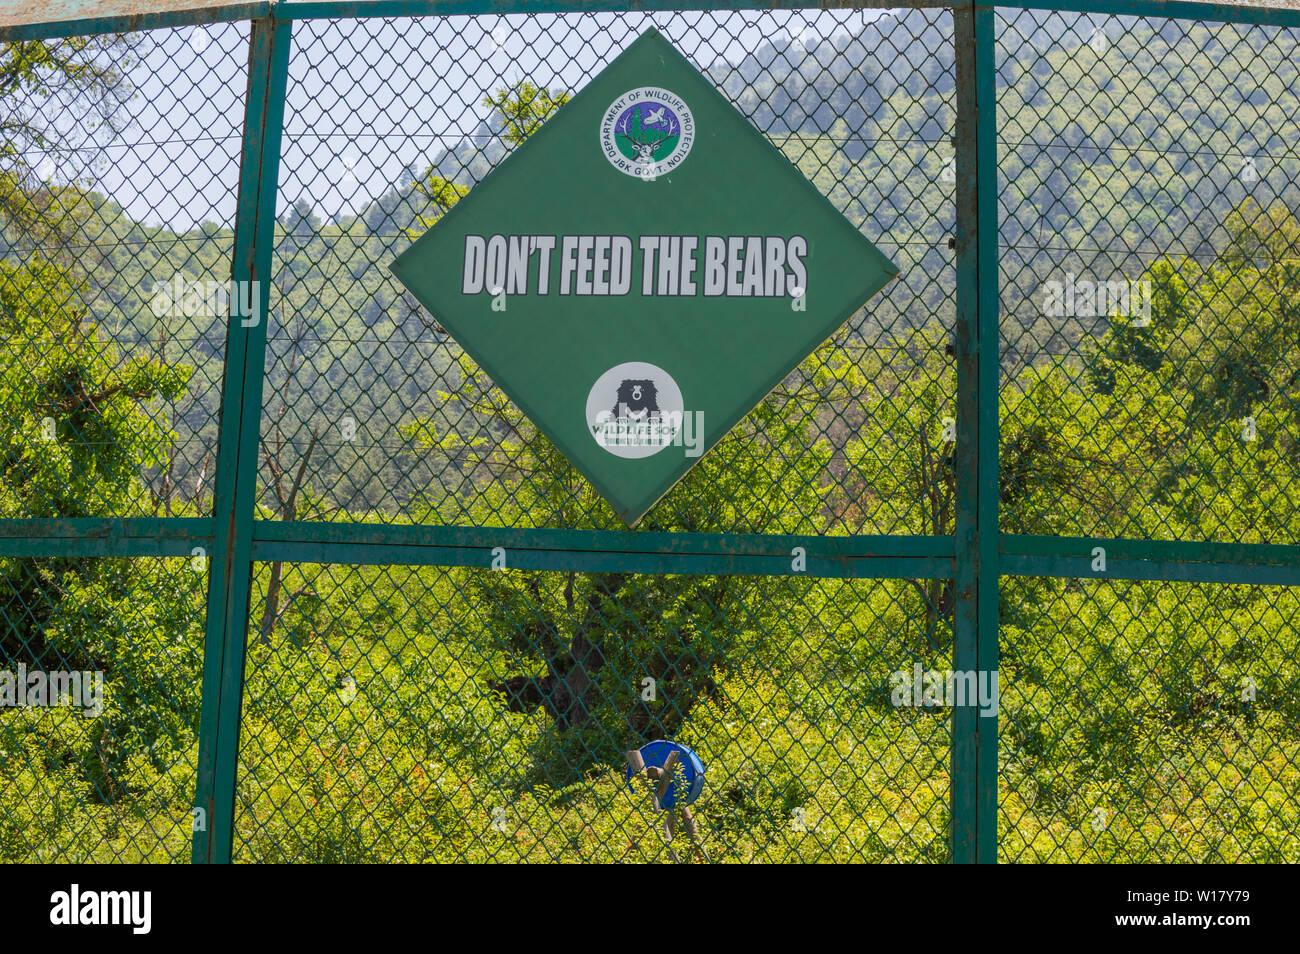 Srinagar, Kashmir, India: Dated- June 19, 2019: A warning sign at a Himalayan Black Bear enclosure at Dachigam National Park in Srinagar, Kashmir - Stock Image